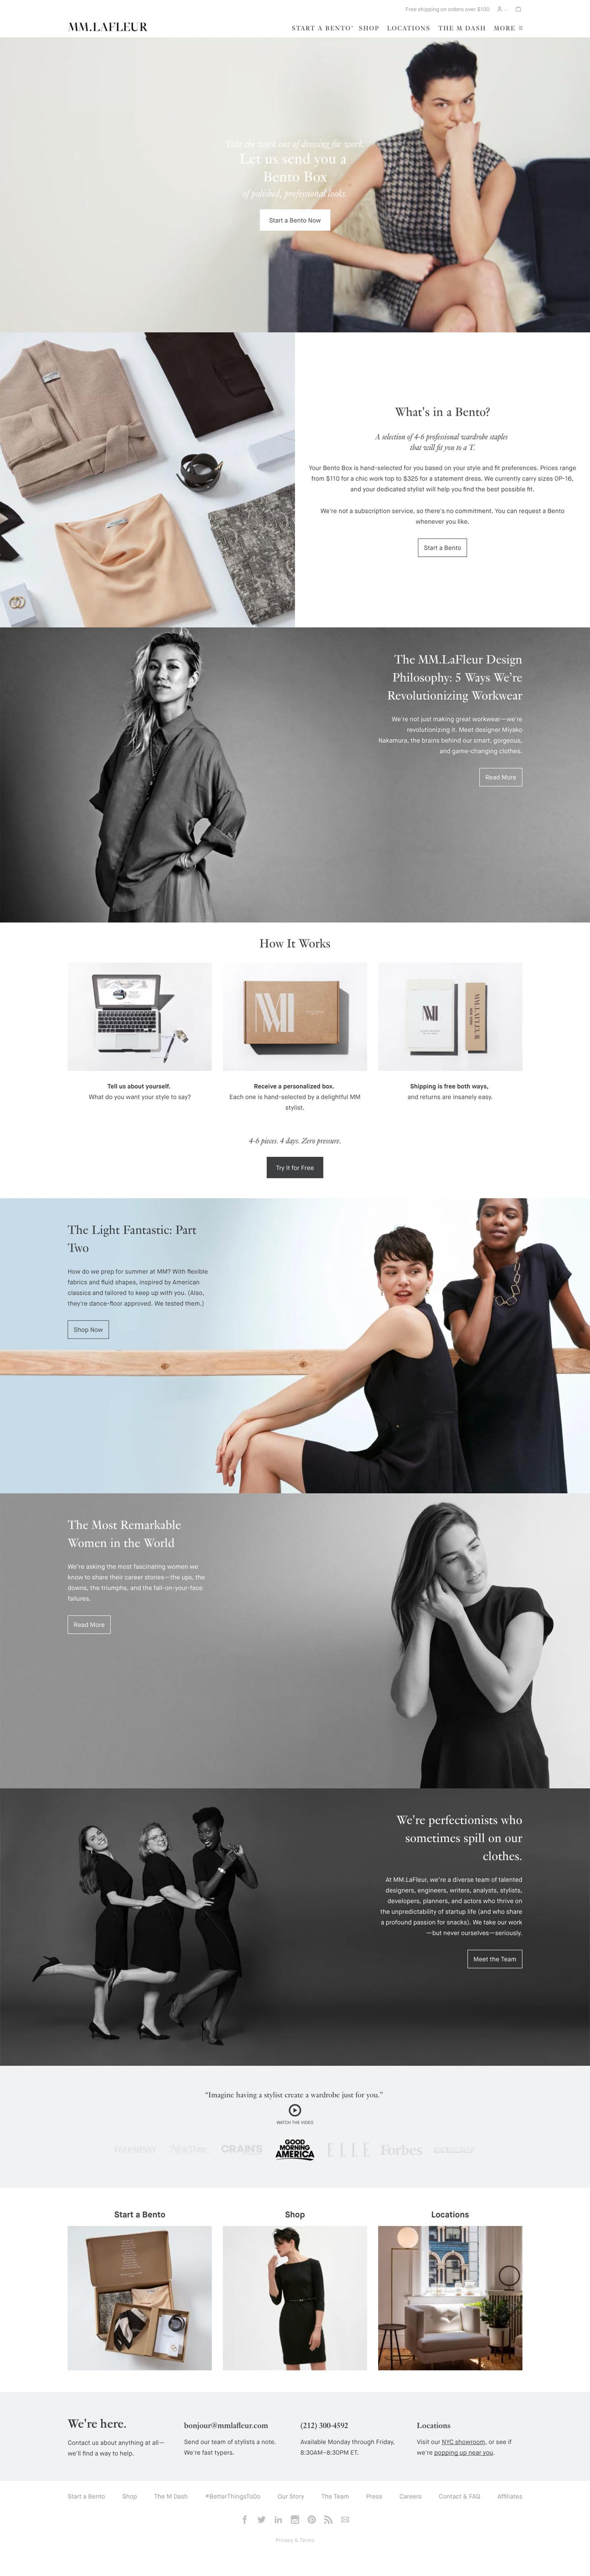 eCommerce website: MM LaFleur